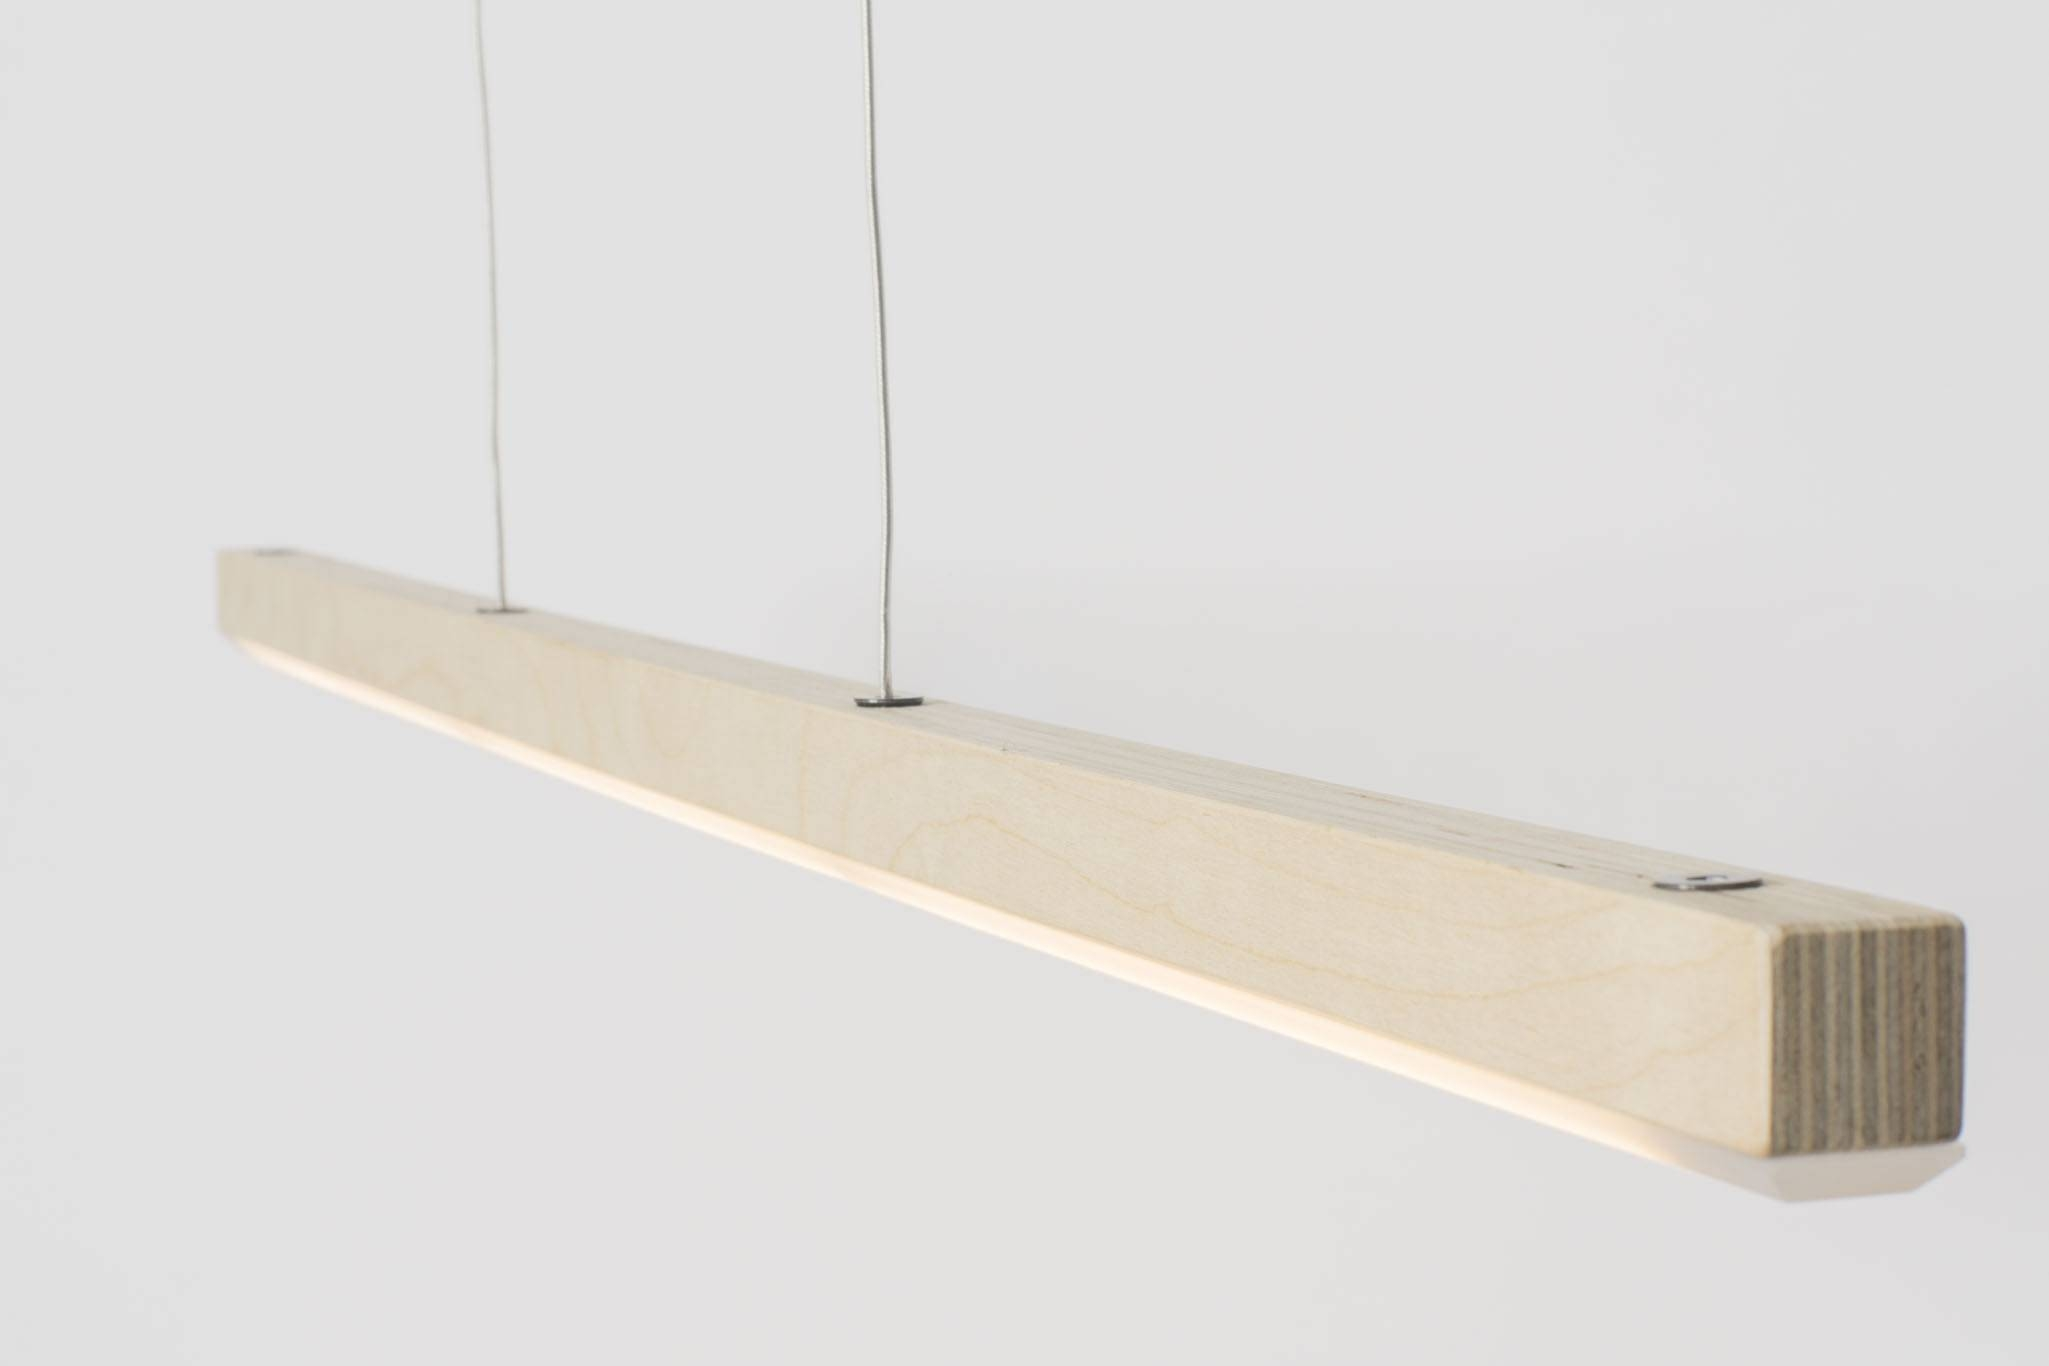 24Mm Line Led Pendant Light – Crowdyhouse regarding Led Pendant Lights (Image 1 of 15)